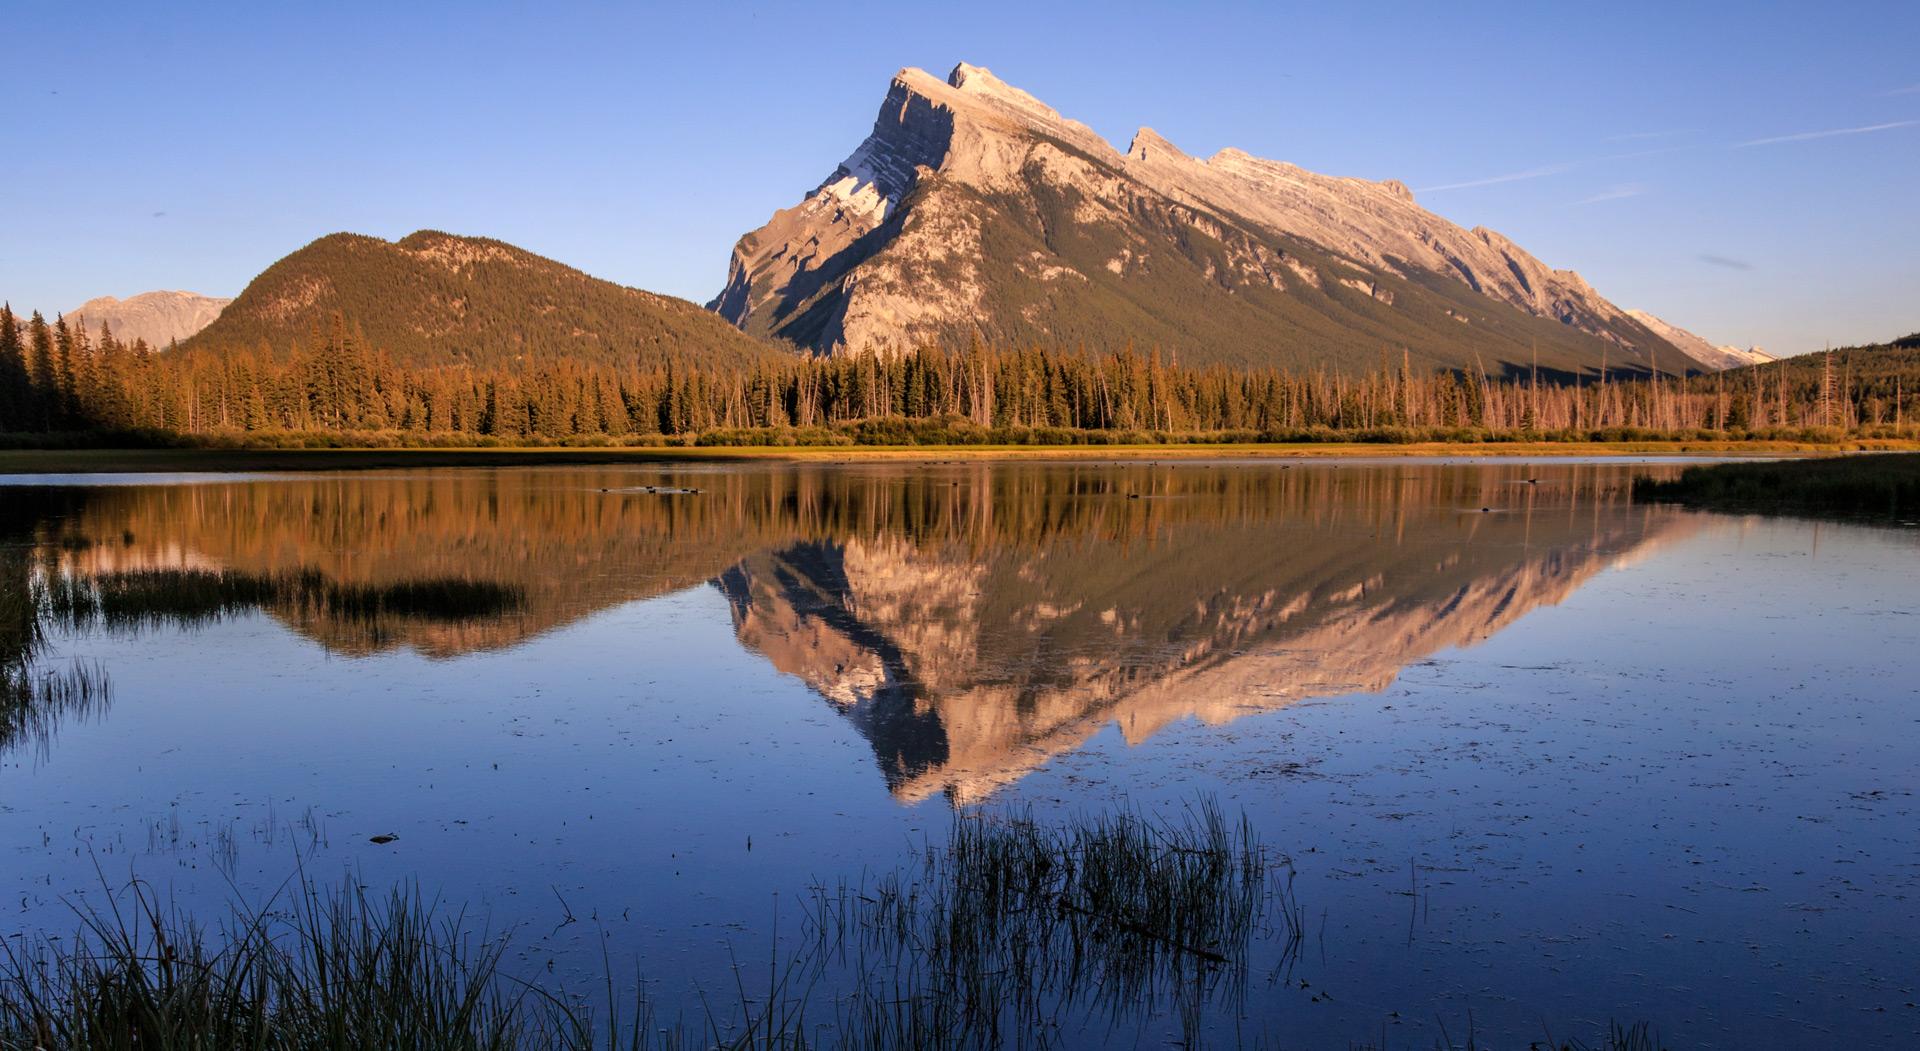 Reflection at Vermillion lakes, Banff